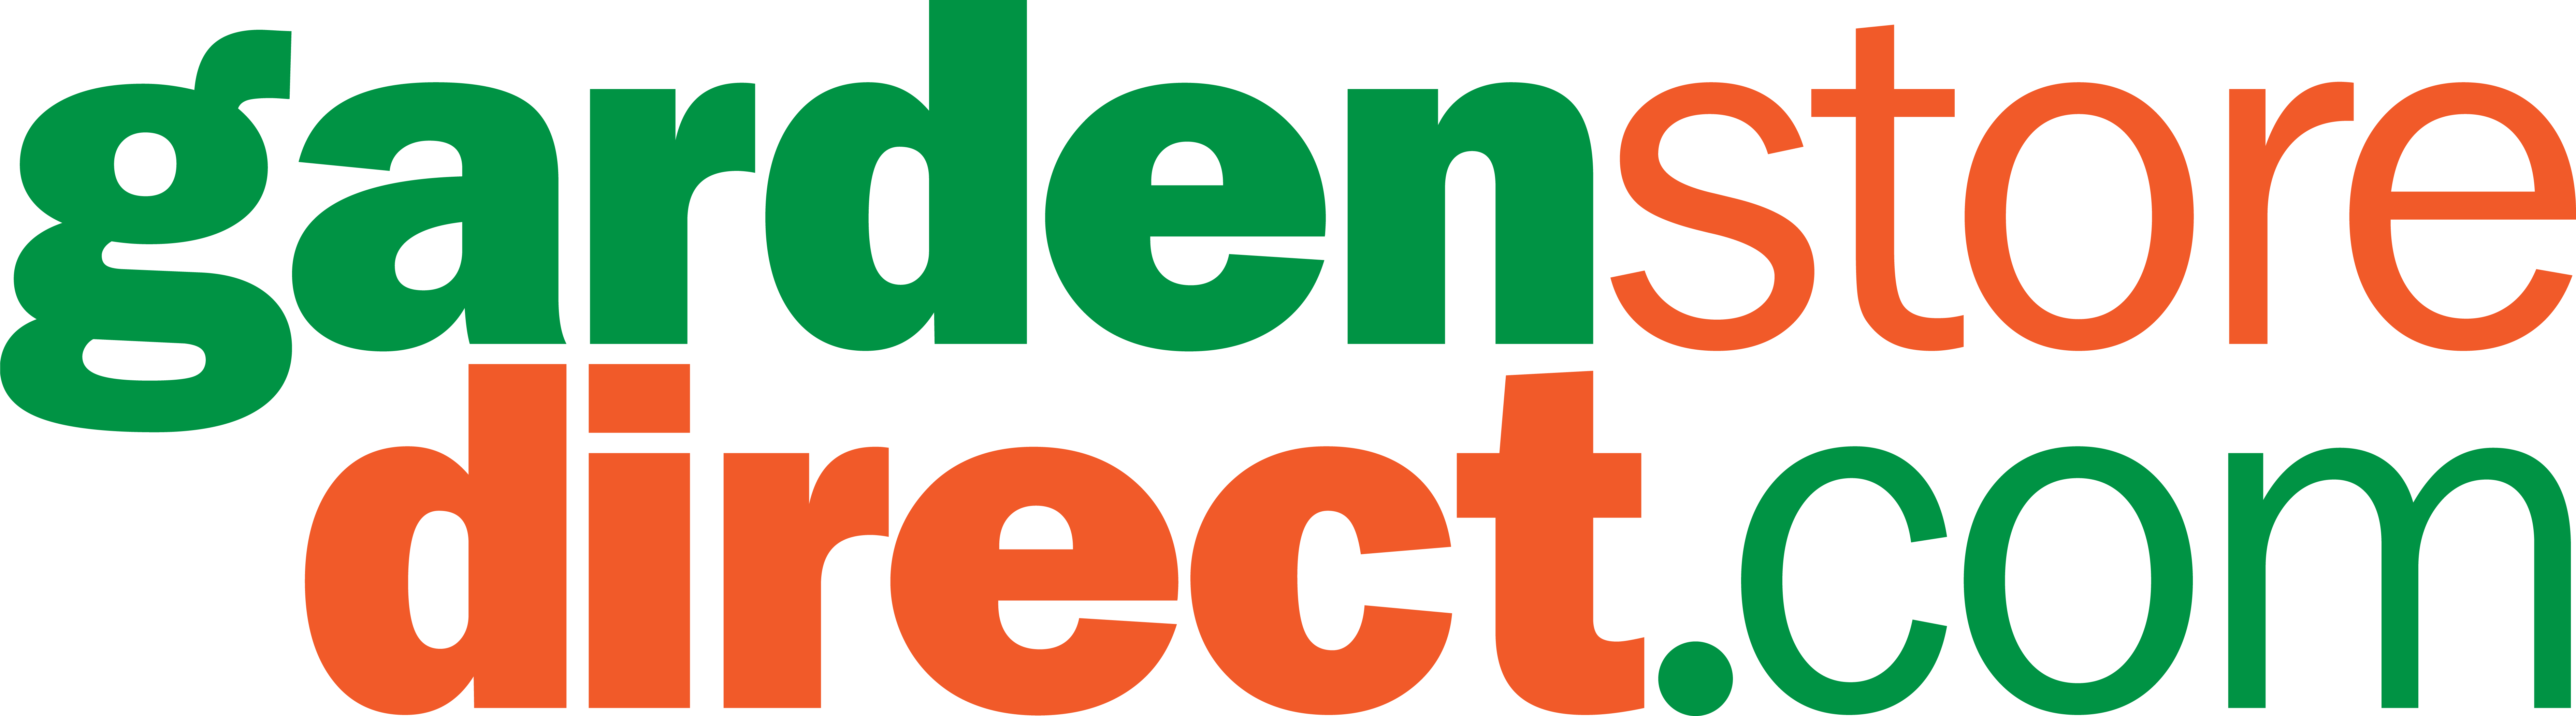 Garden Store Direct